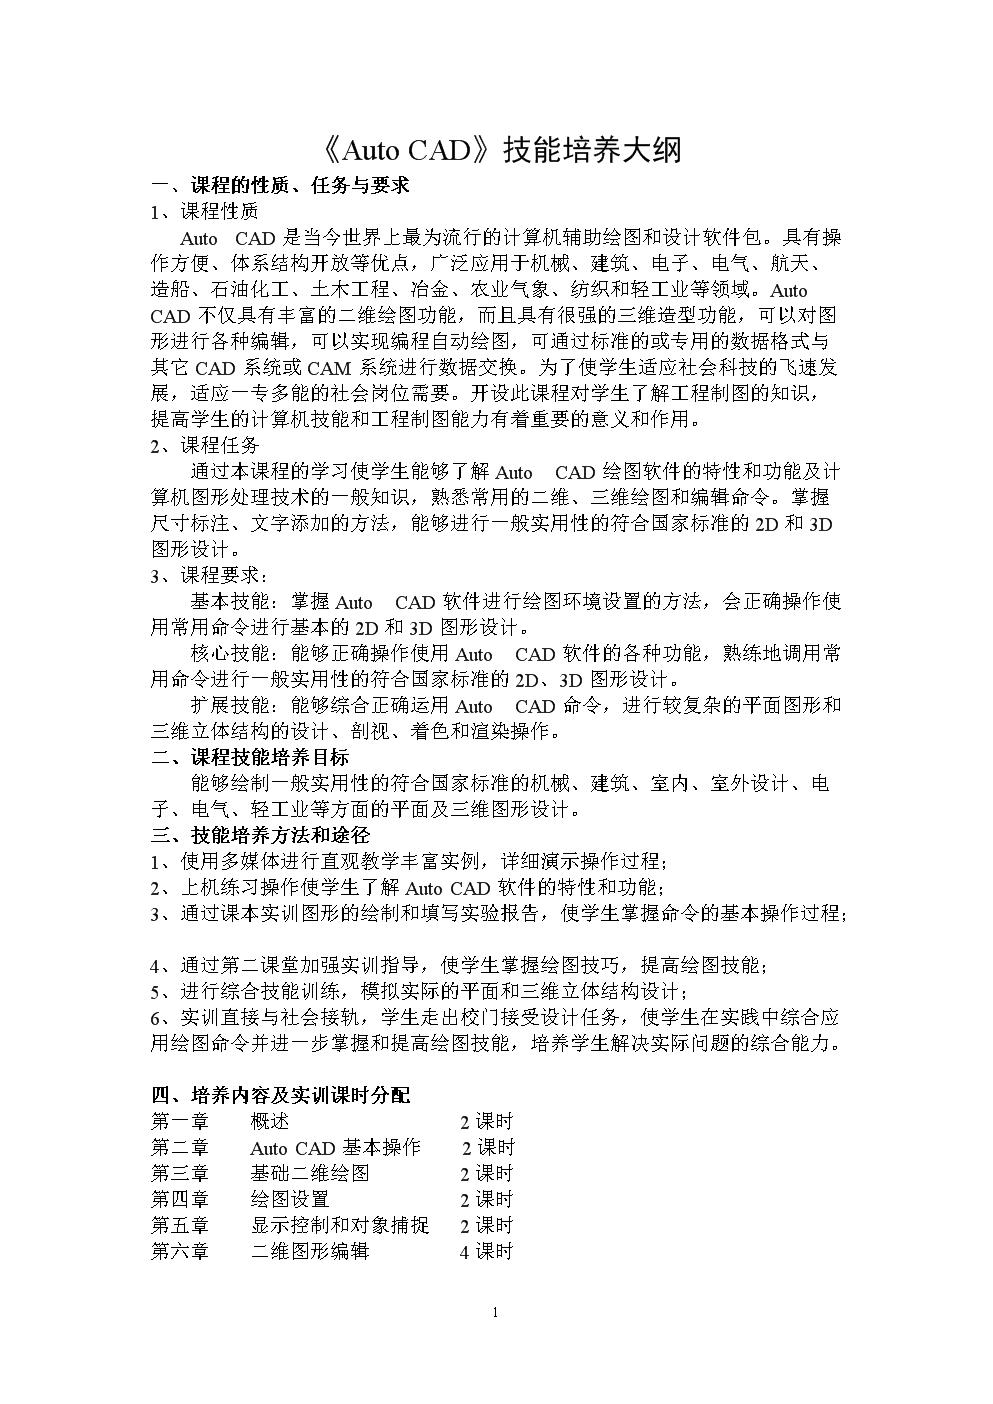 《AutoCAD》技能培养大纲.doc